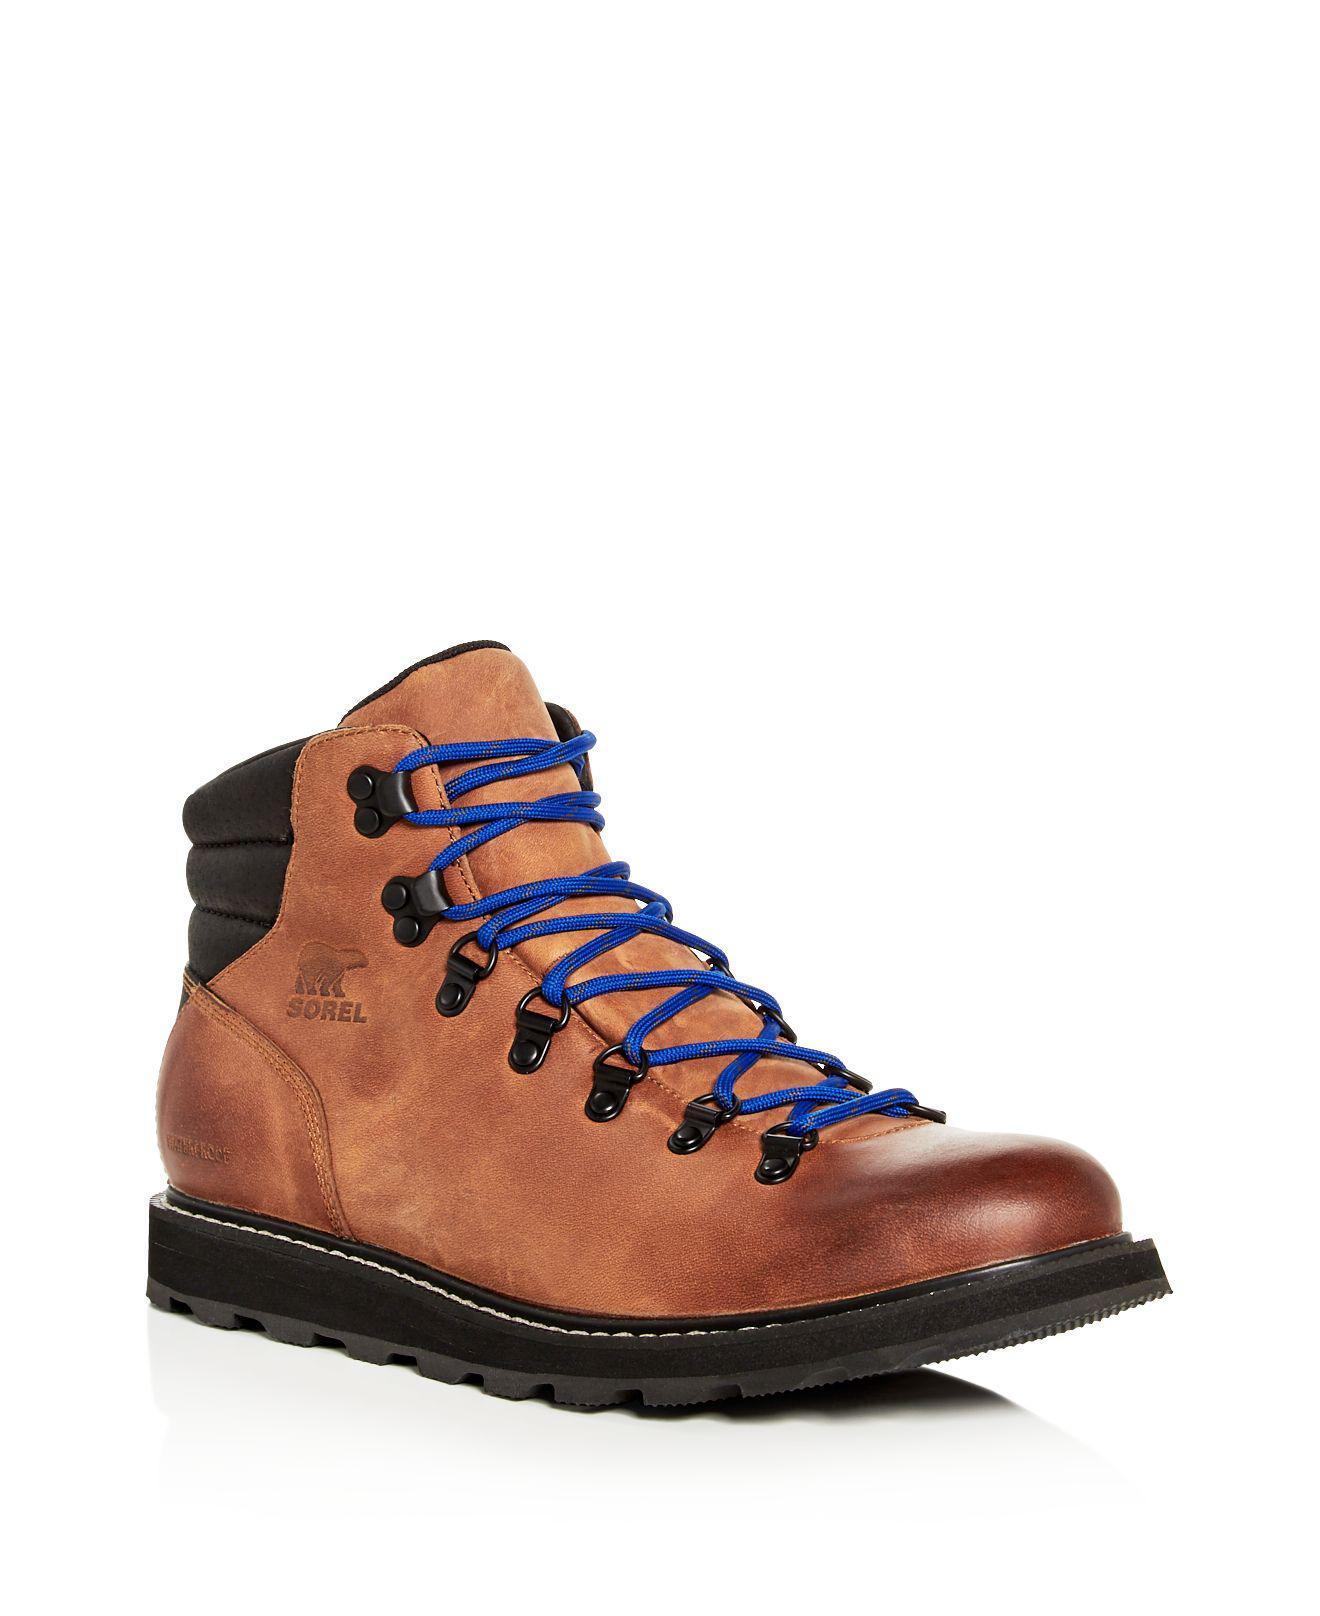 huge discount 184a0 45e61 SOREL Madson Hiker Waterproof nOHEzyE5,online